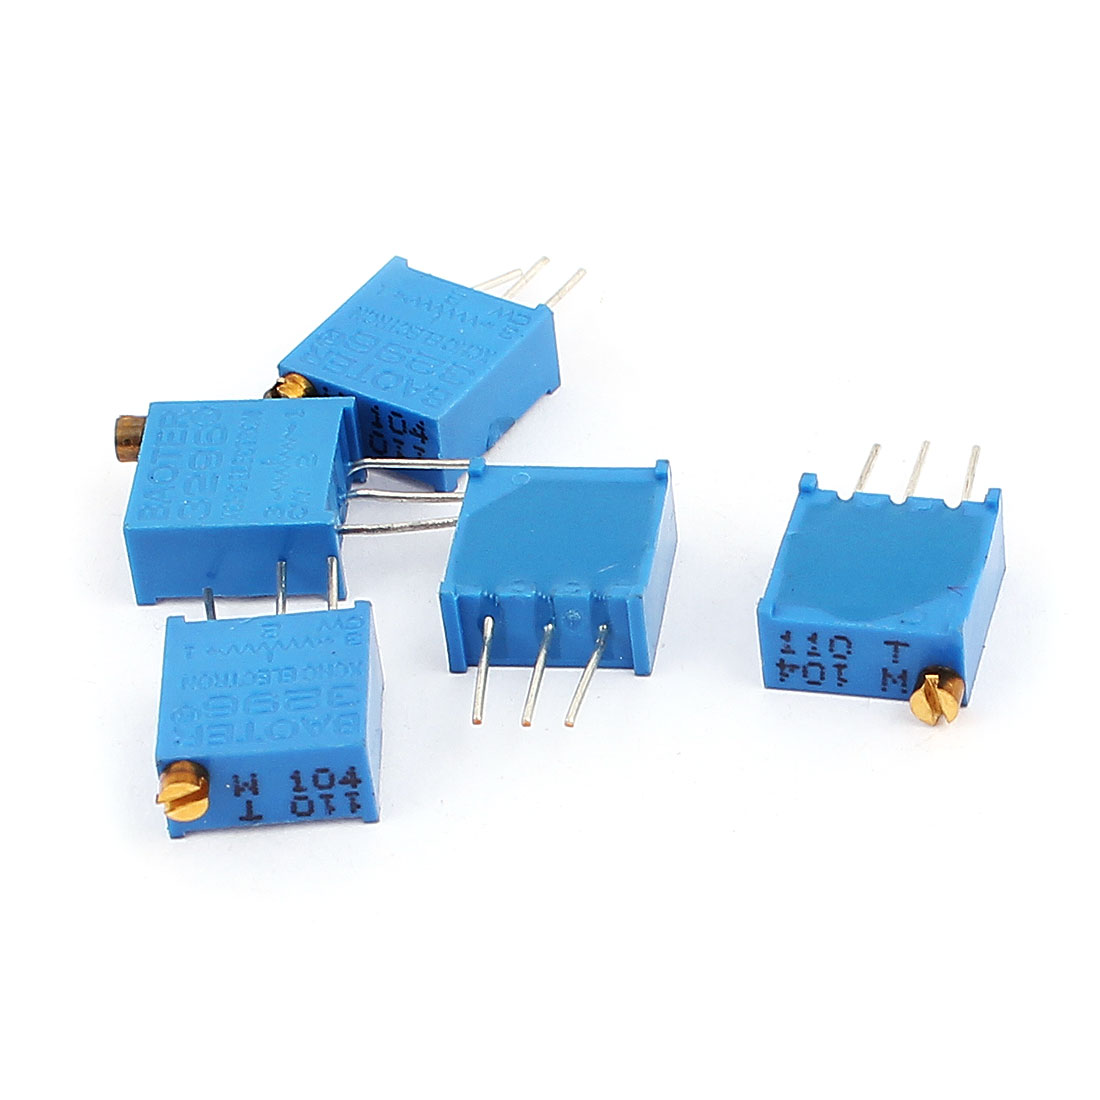 5 Pcs 3296w 100k Ohm Variable Resistor Adjustable For Multiturn Circuit Potentiometer